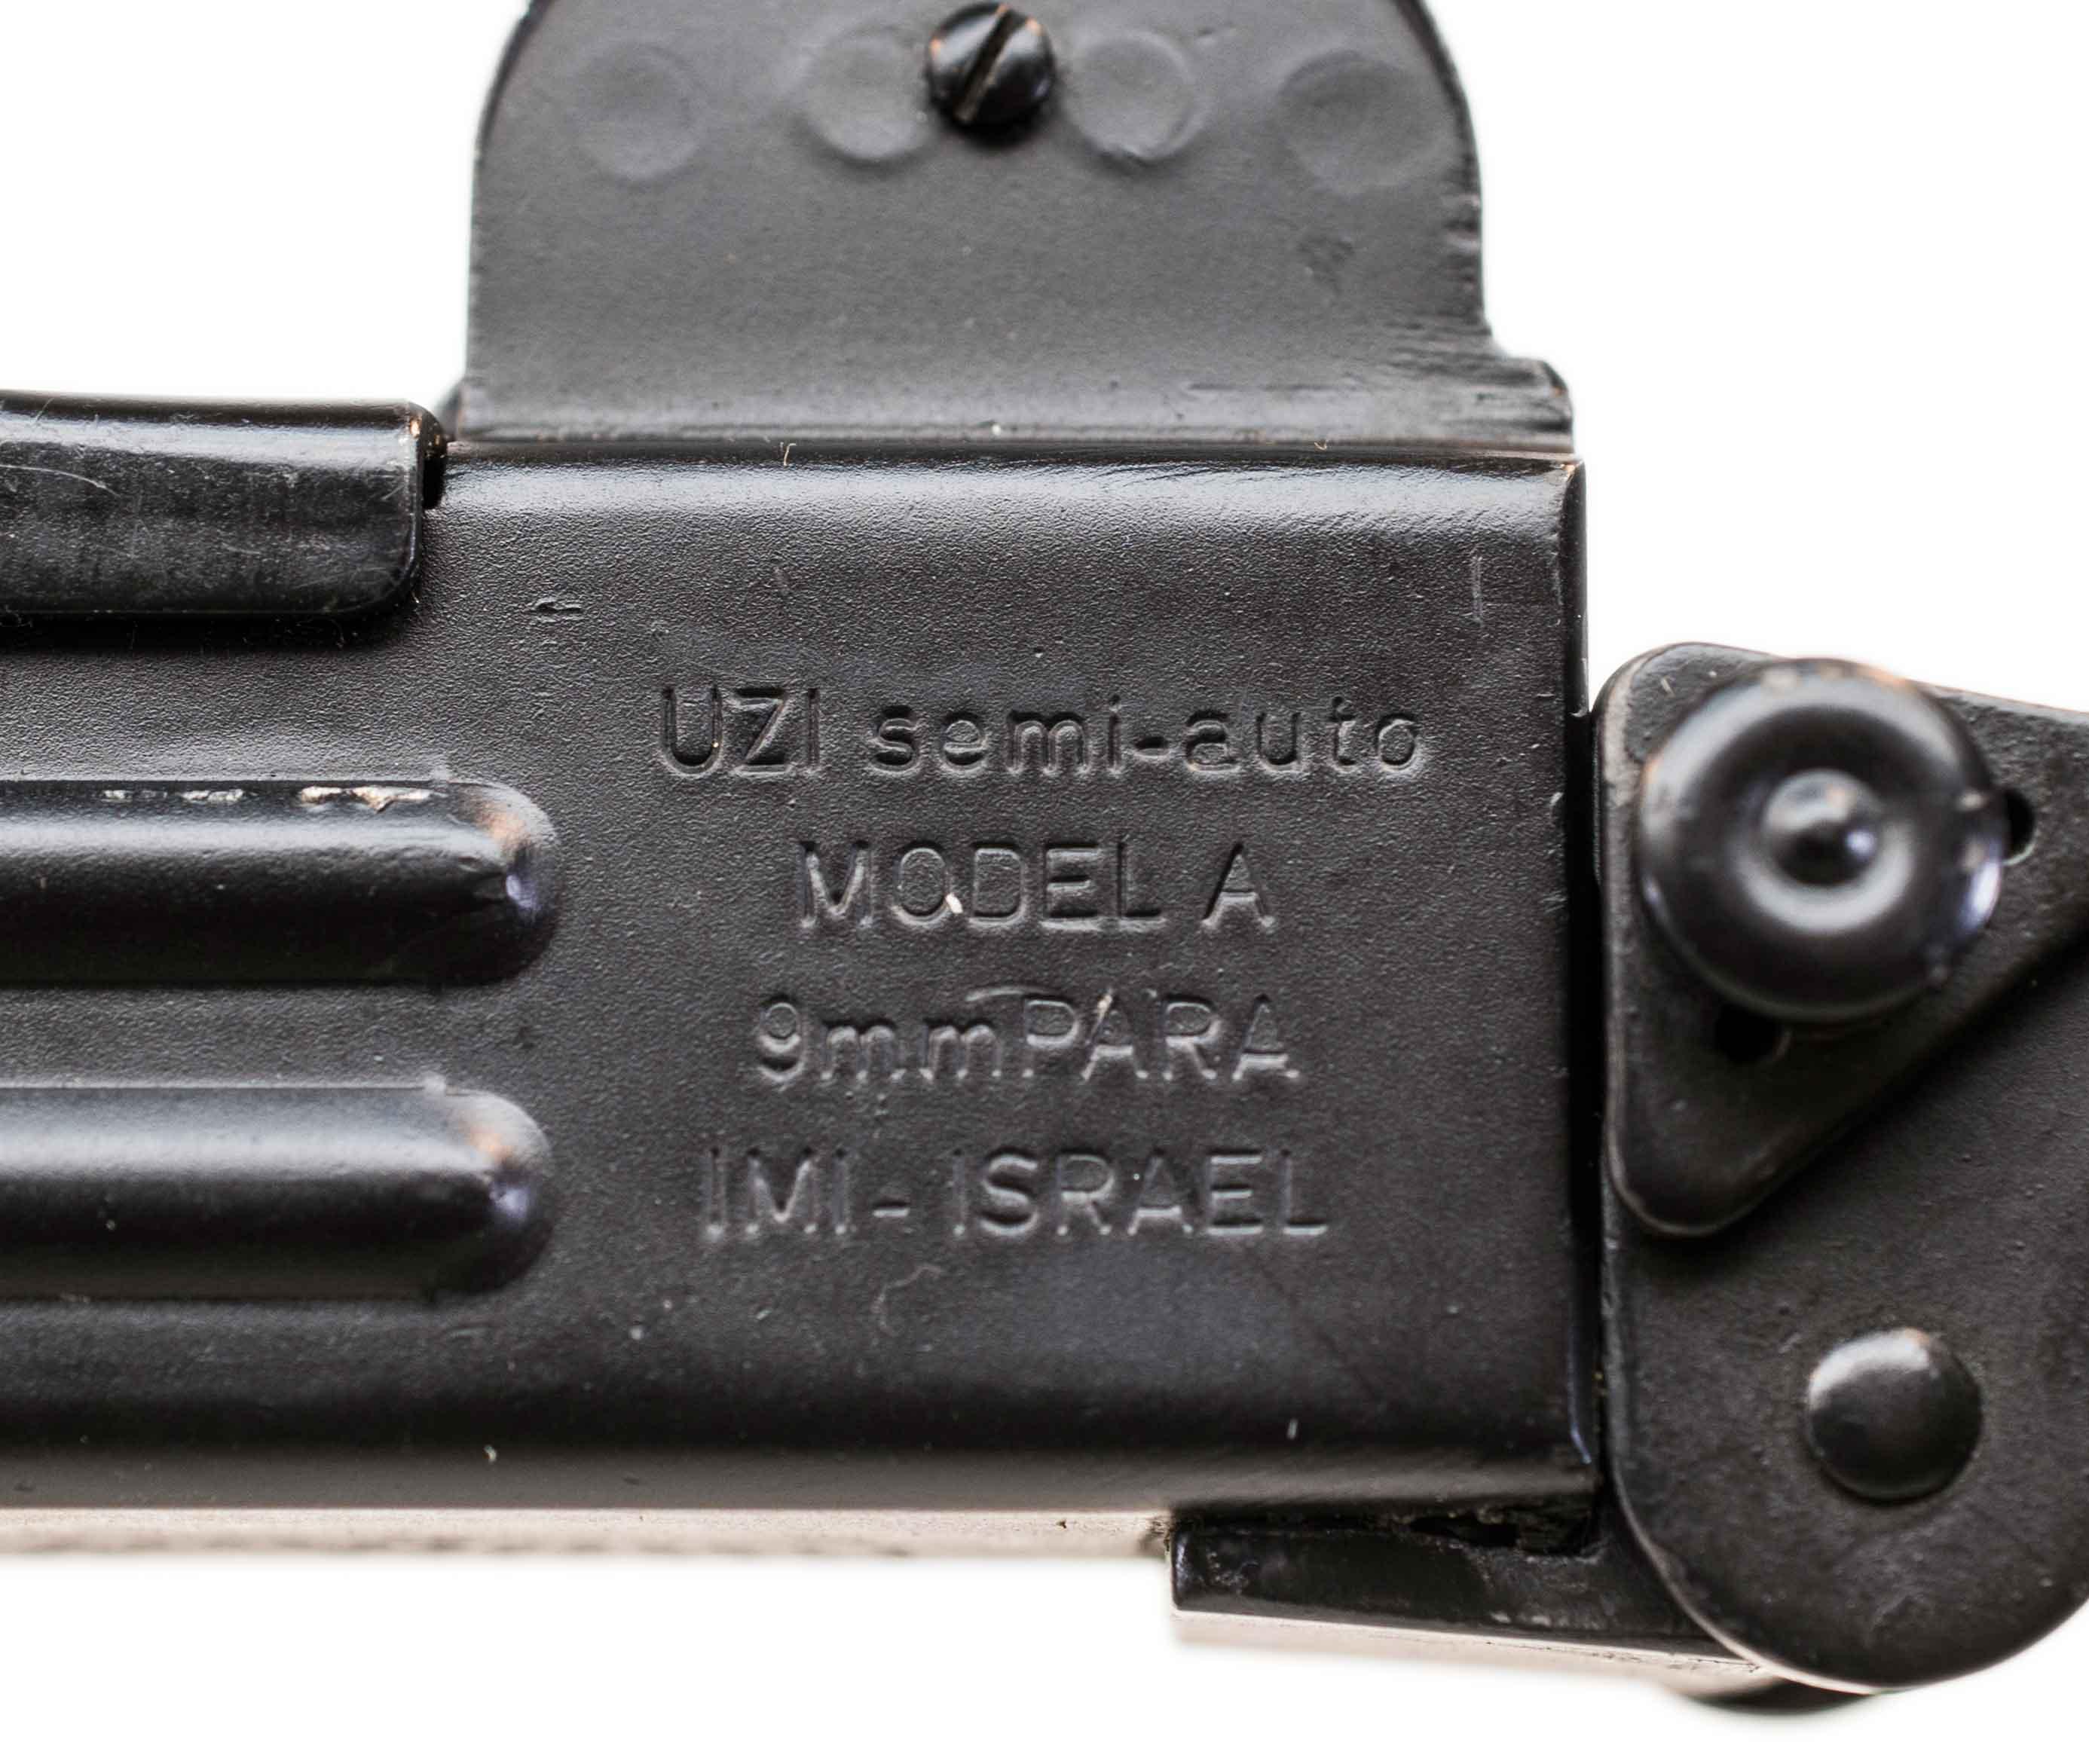 UZI MODEL A 9MM (Auction ID: 5200859, End Time : Sep  17